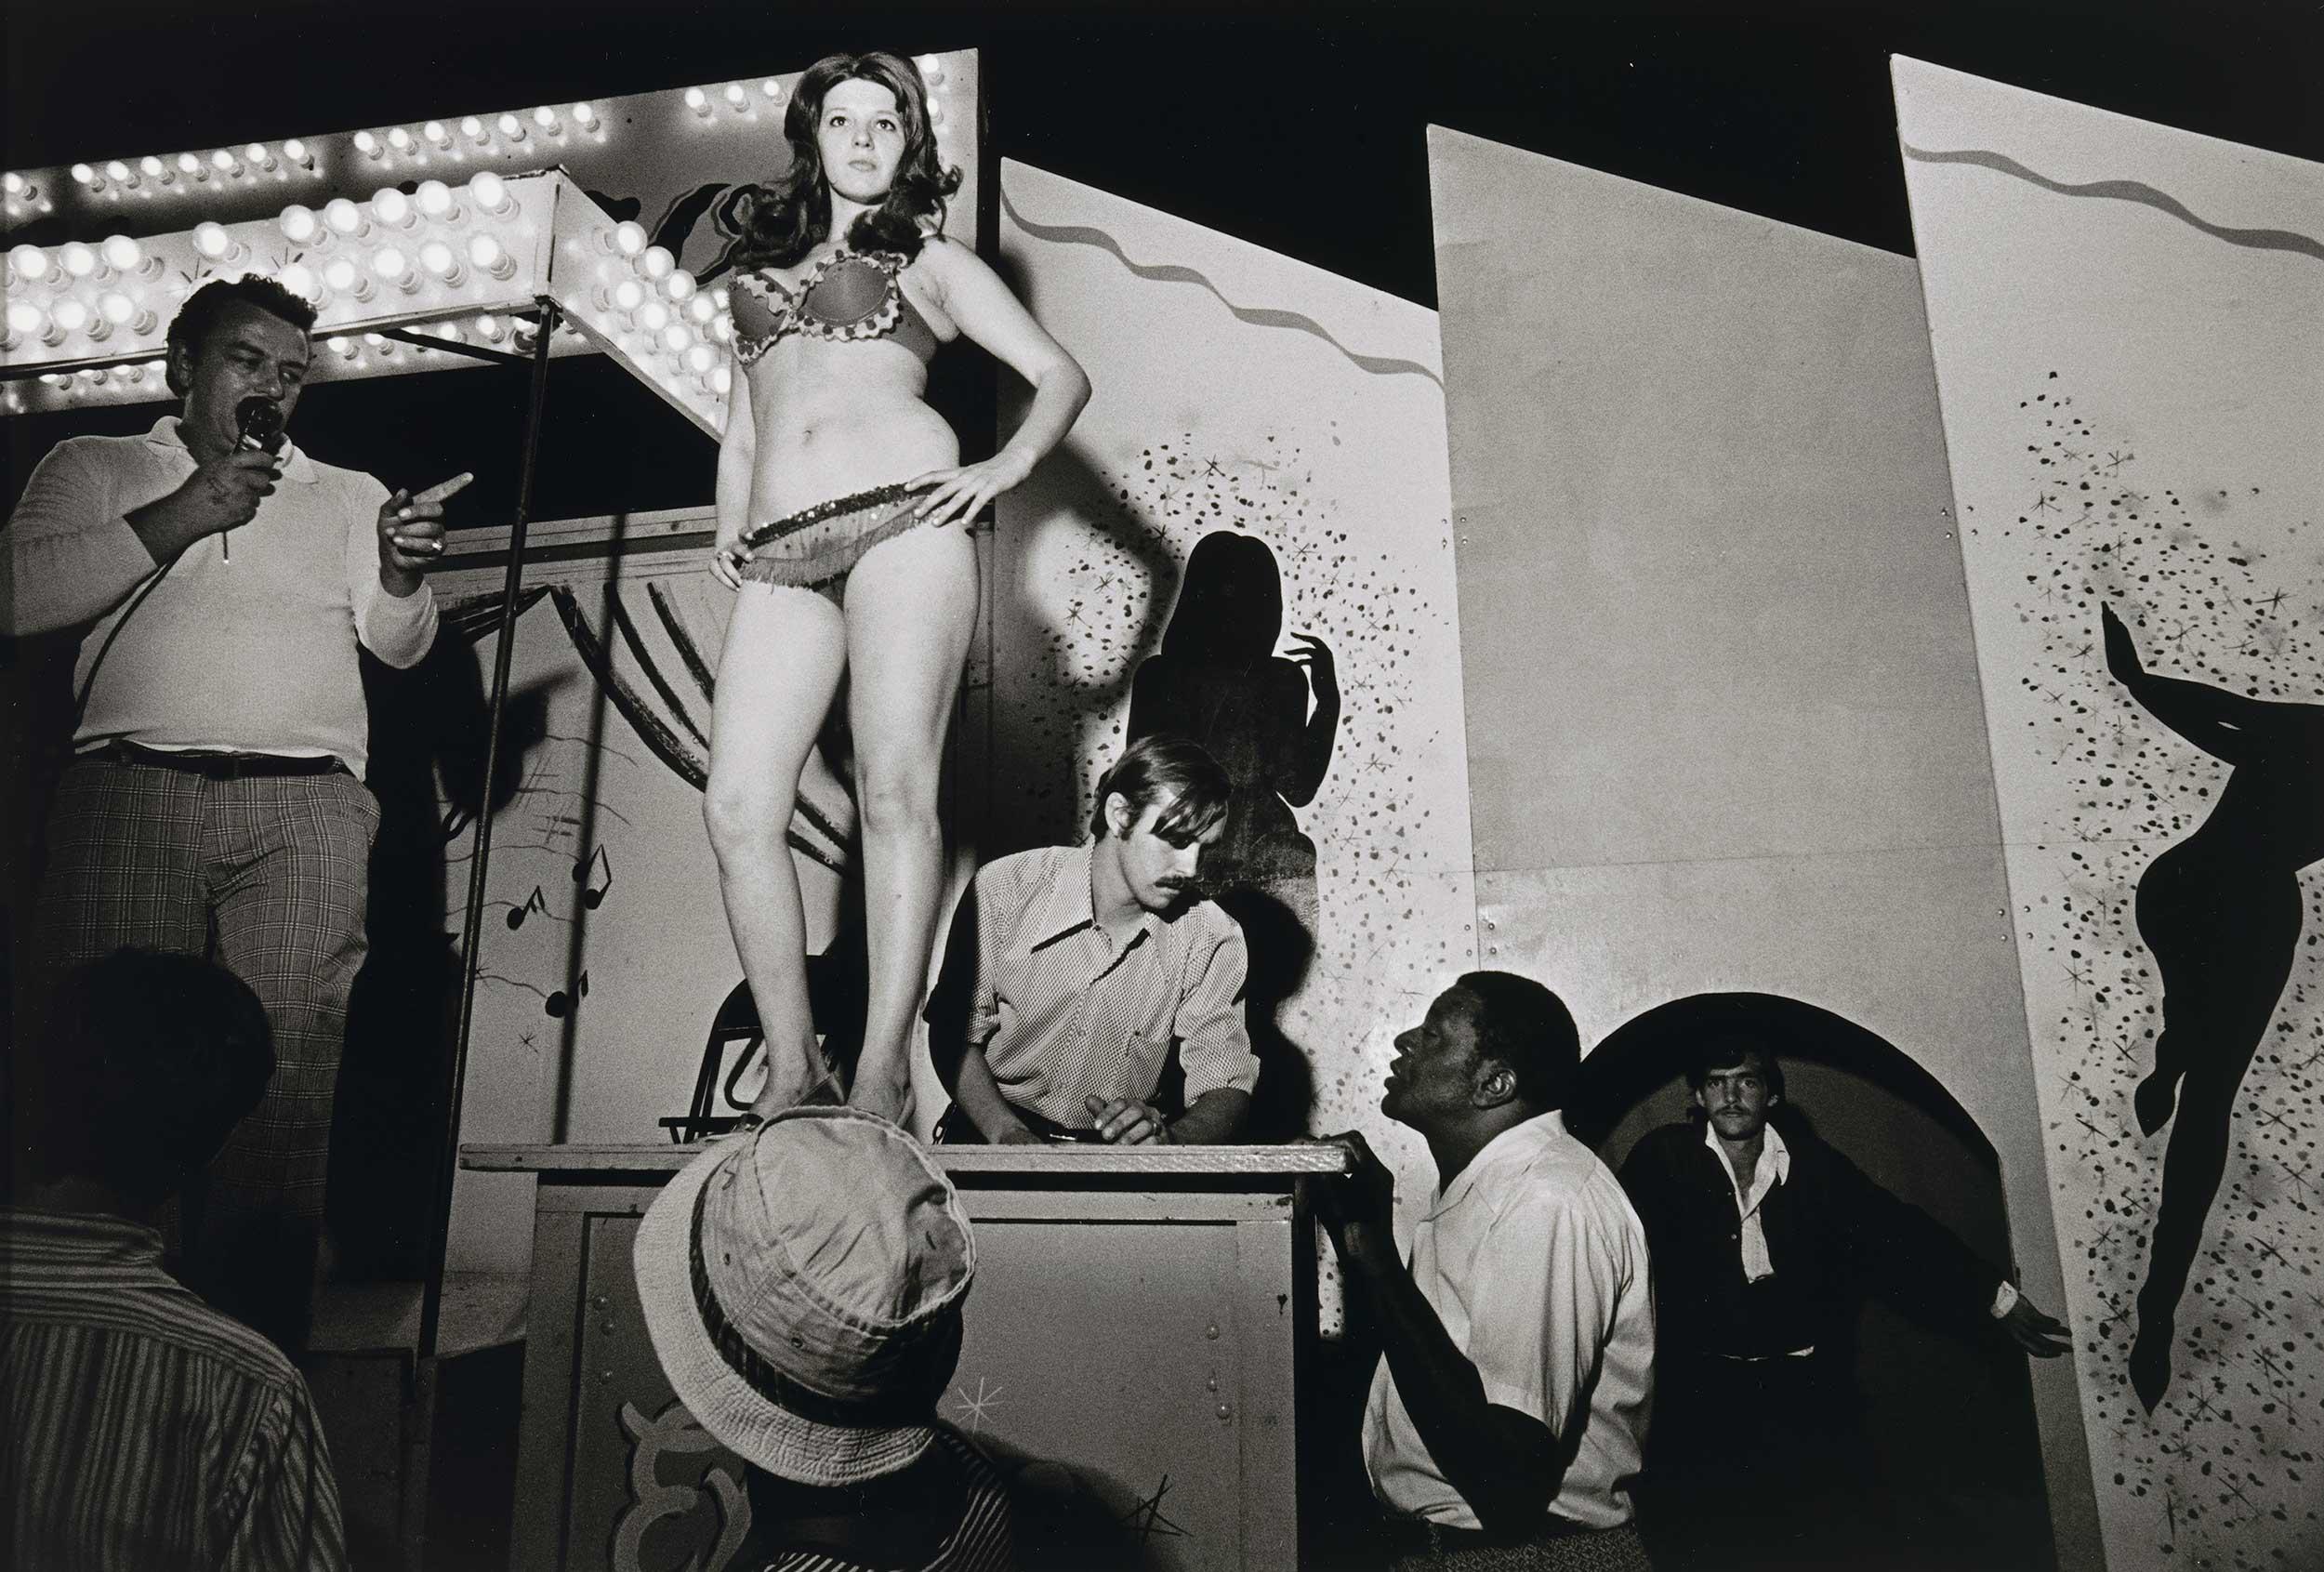 Lena on the Bally Box, Essex Junction, Vt., 1973.